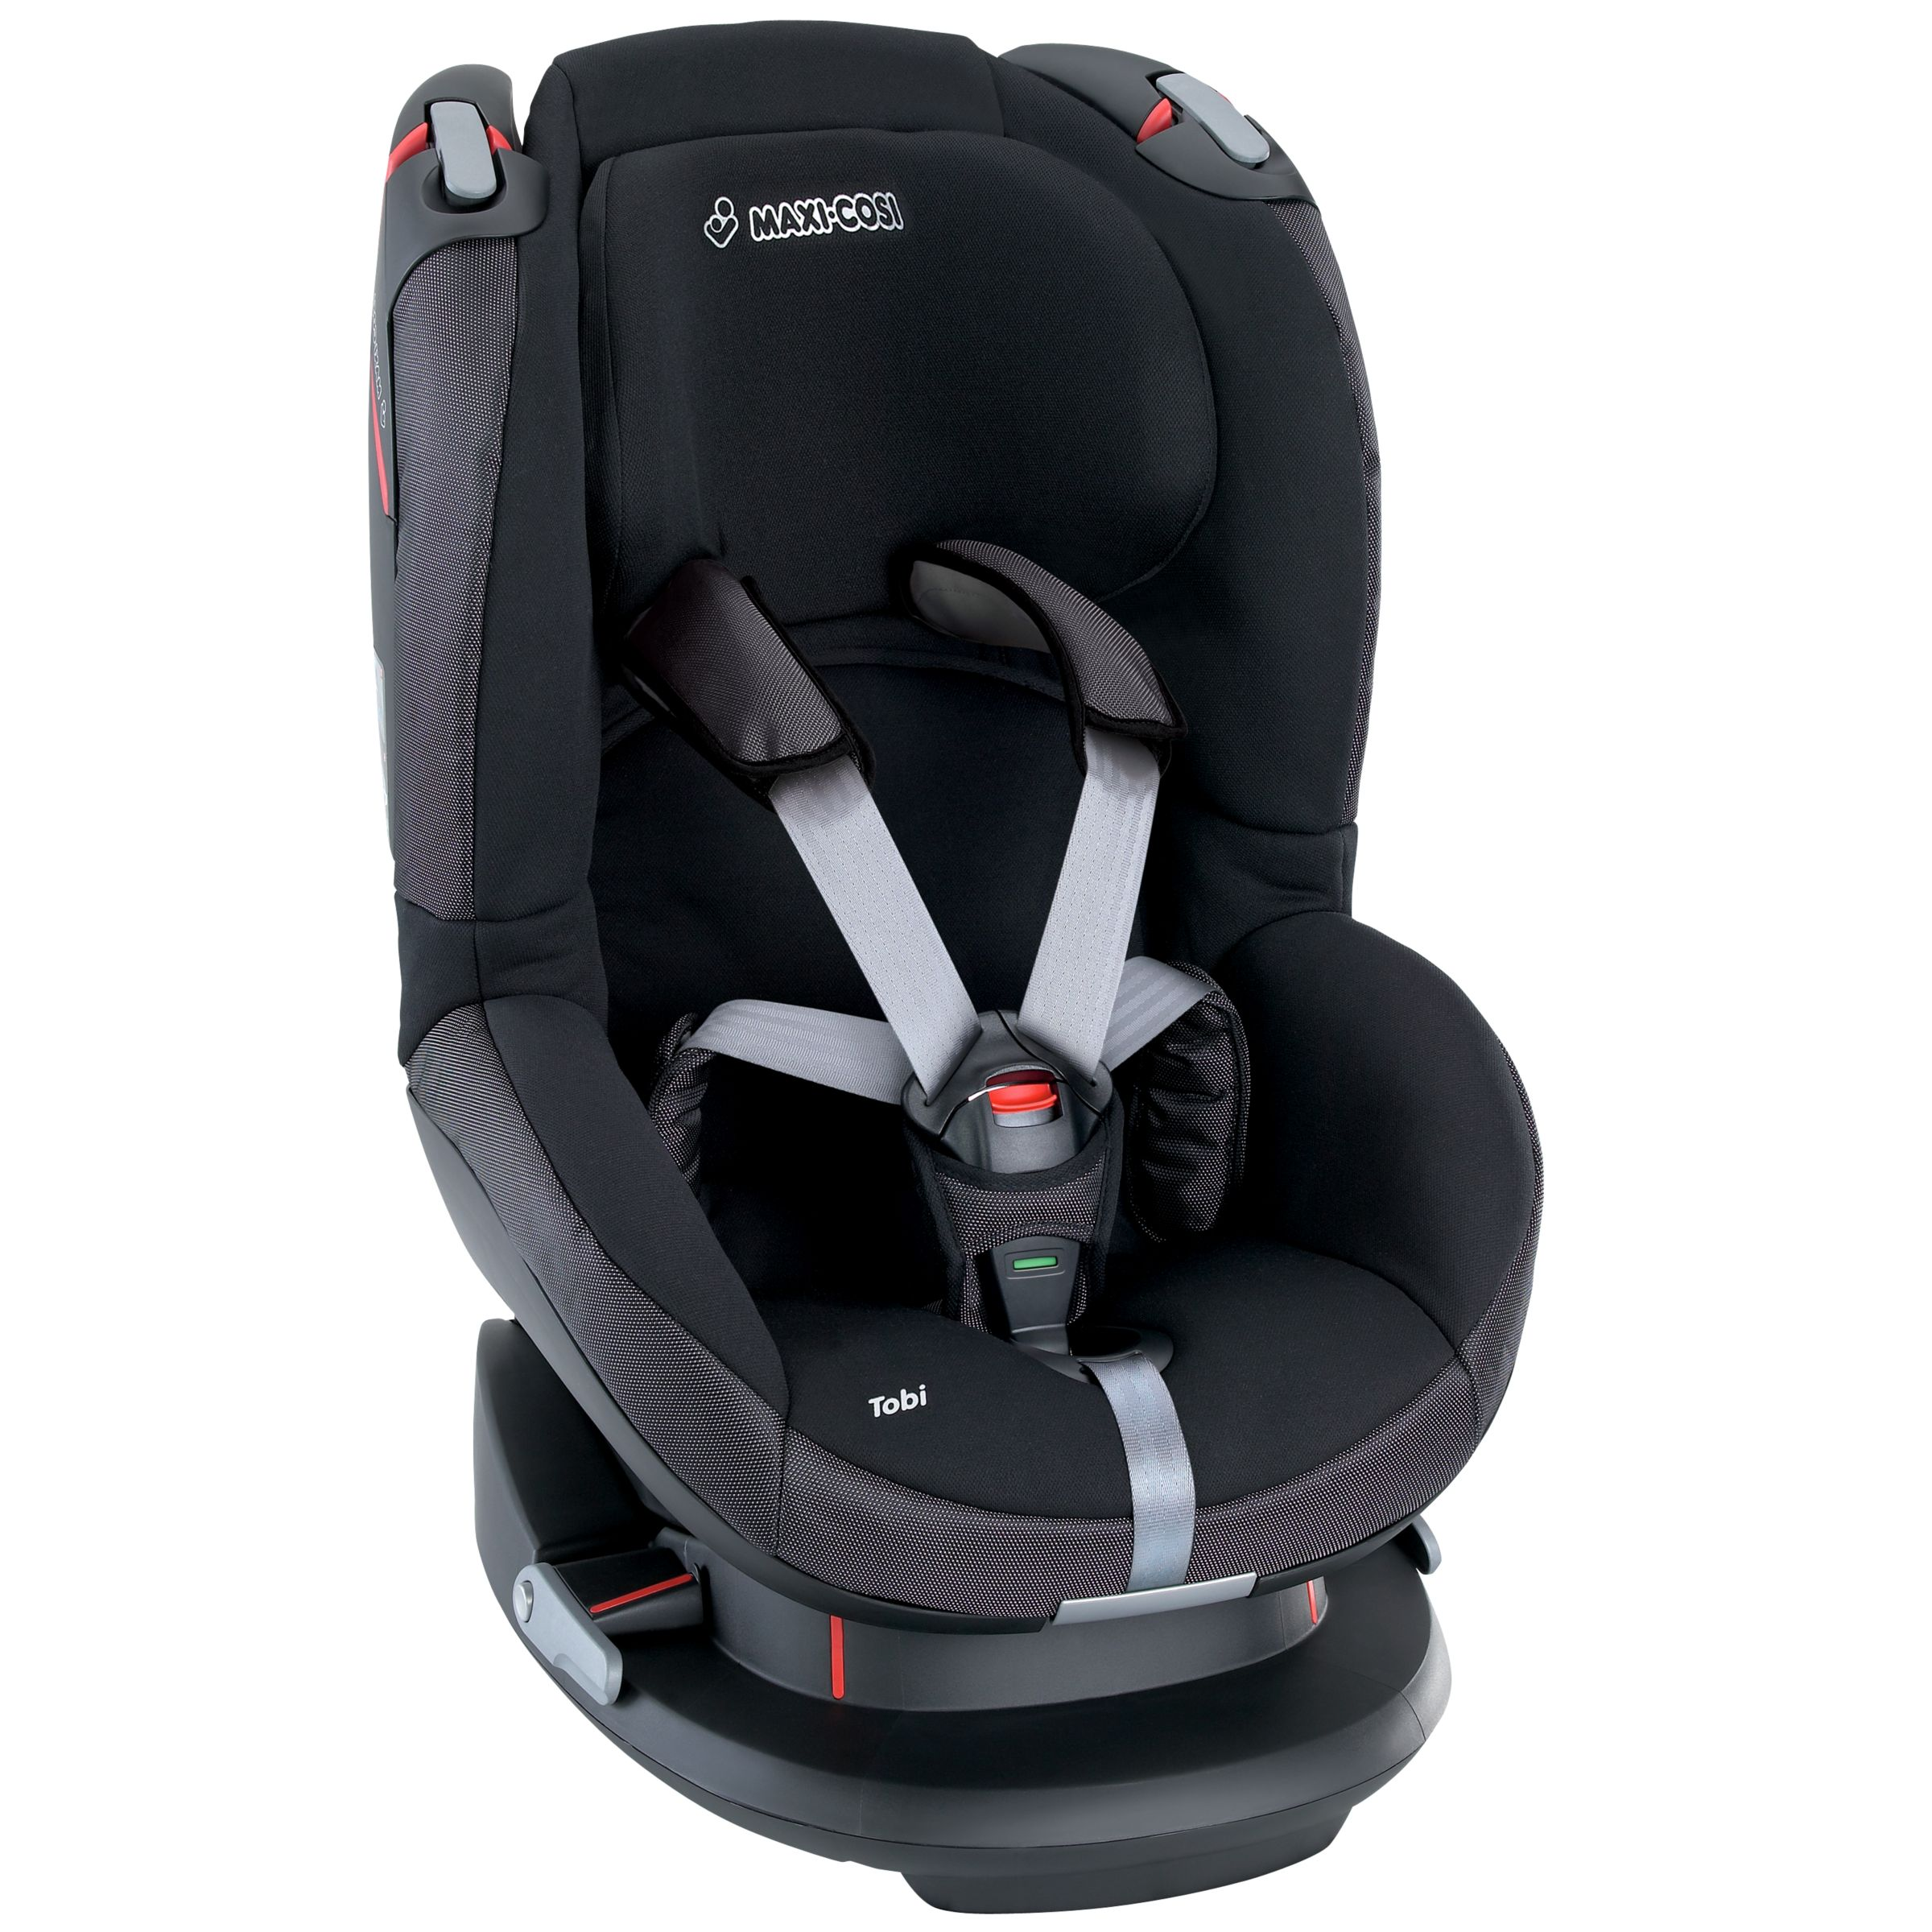 maxi cosi tobi child car seat compare prices at foundem. Black Bedroom Furniture Sets. Home Design Ideas